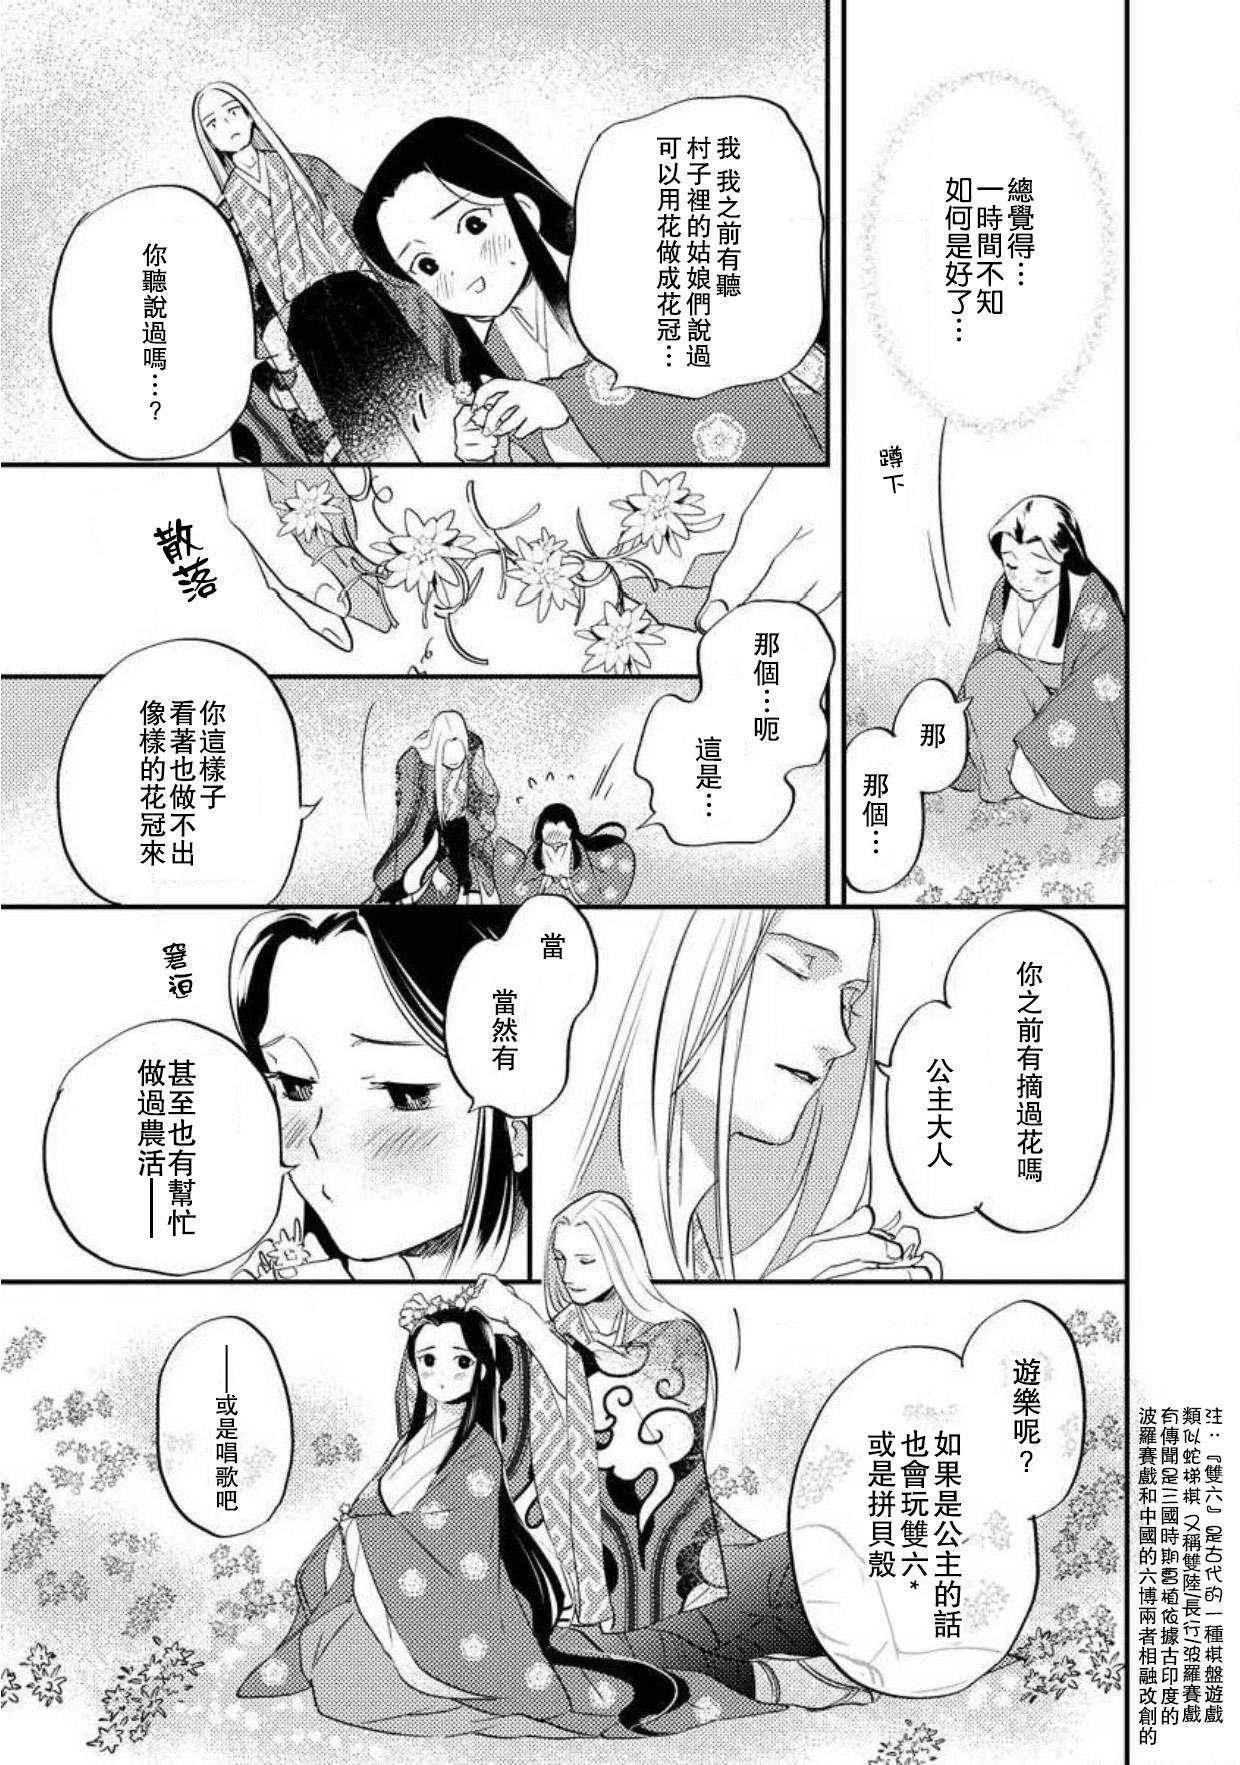 Oeyama suimutan utsukushiki oni no toraware hime | 大江山醉夢逸話 美麗的鬼與被囚禁的公主 Ch. 1-8 192